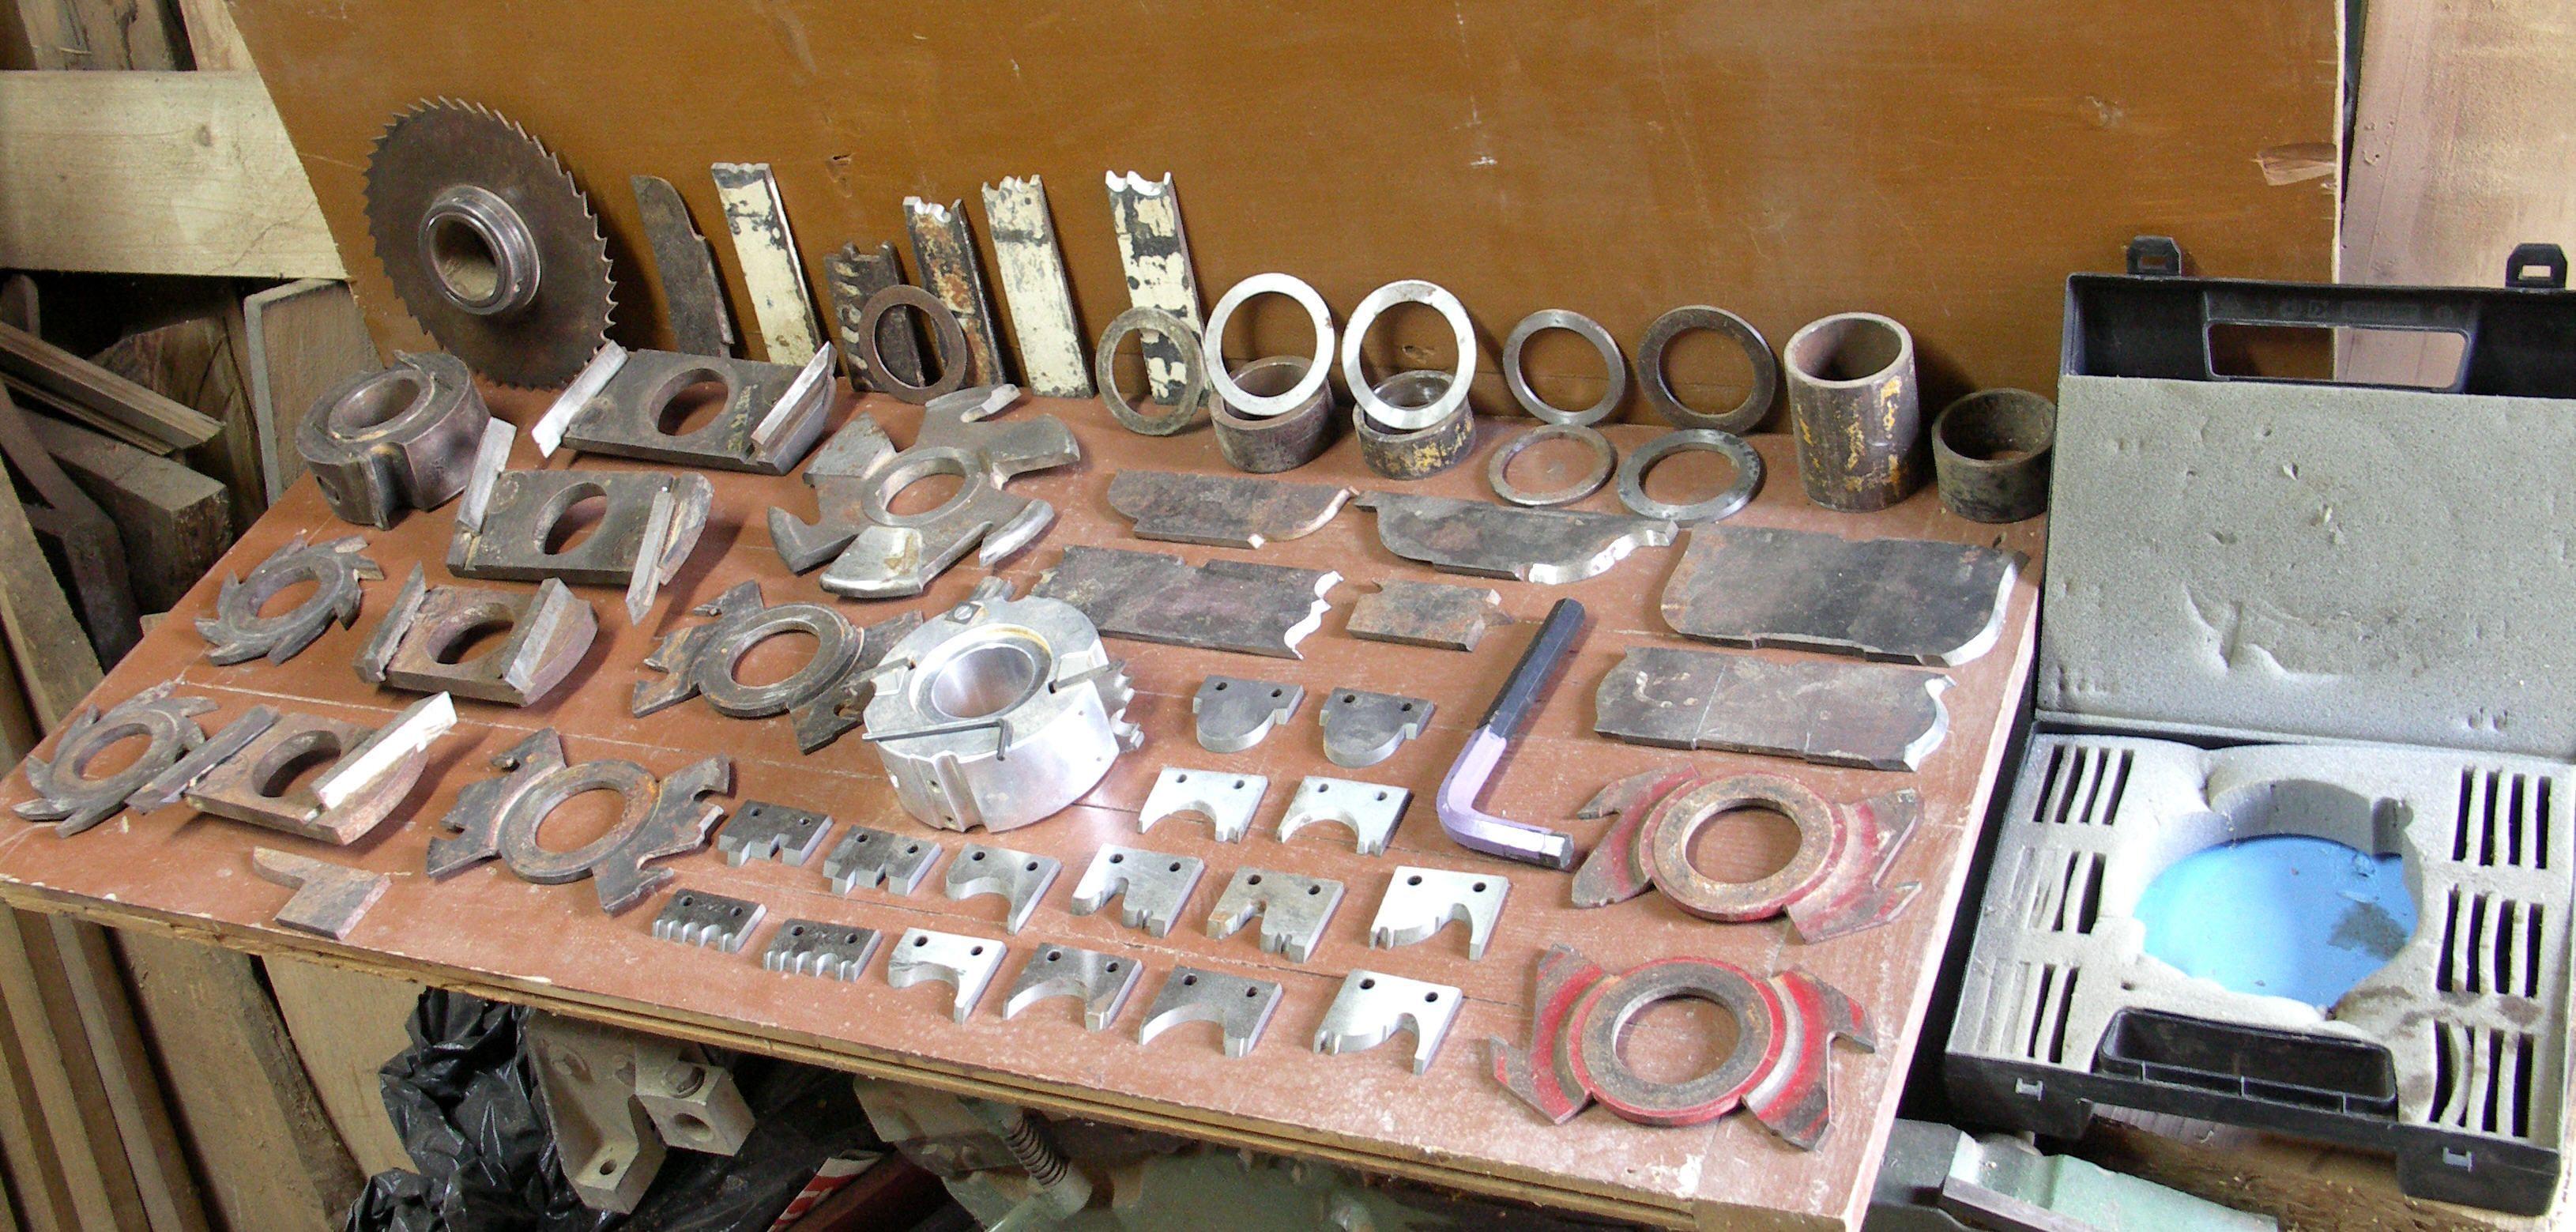 Atelier mes outils mes machines - Toupie a bois ...